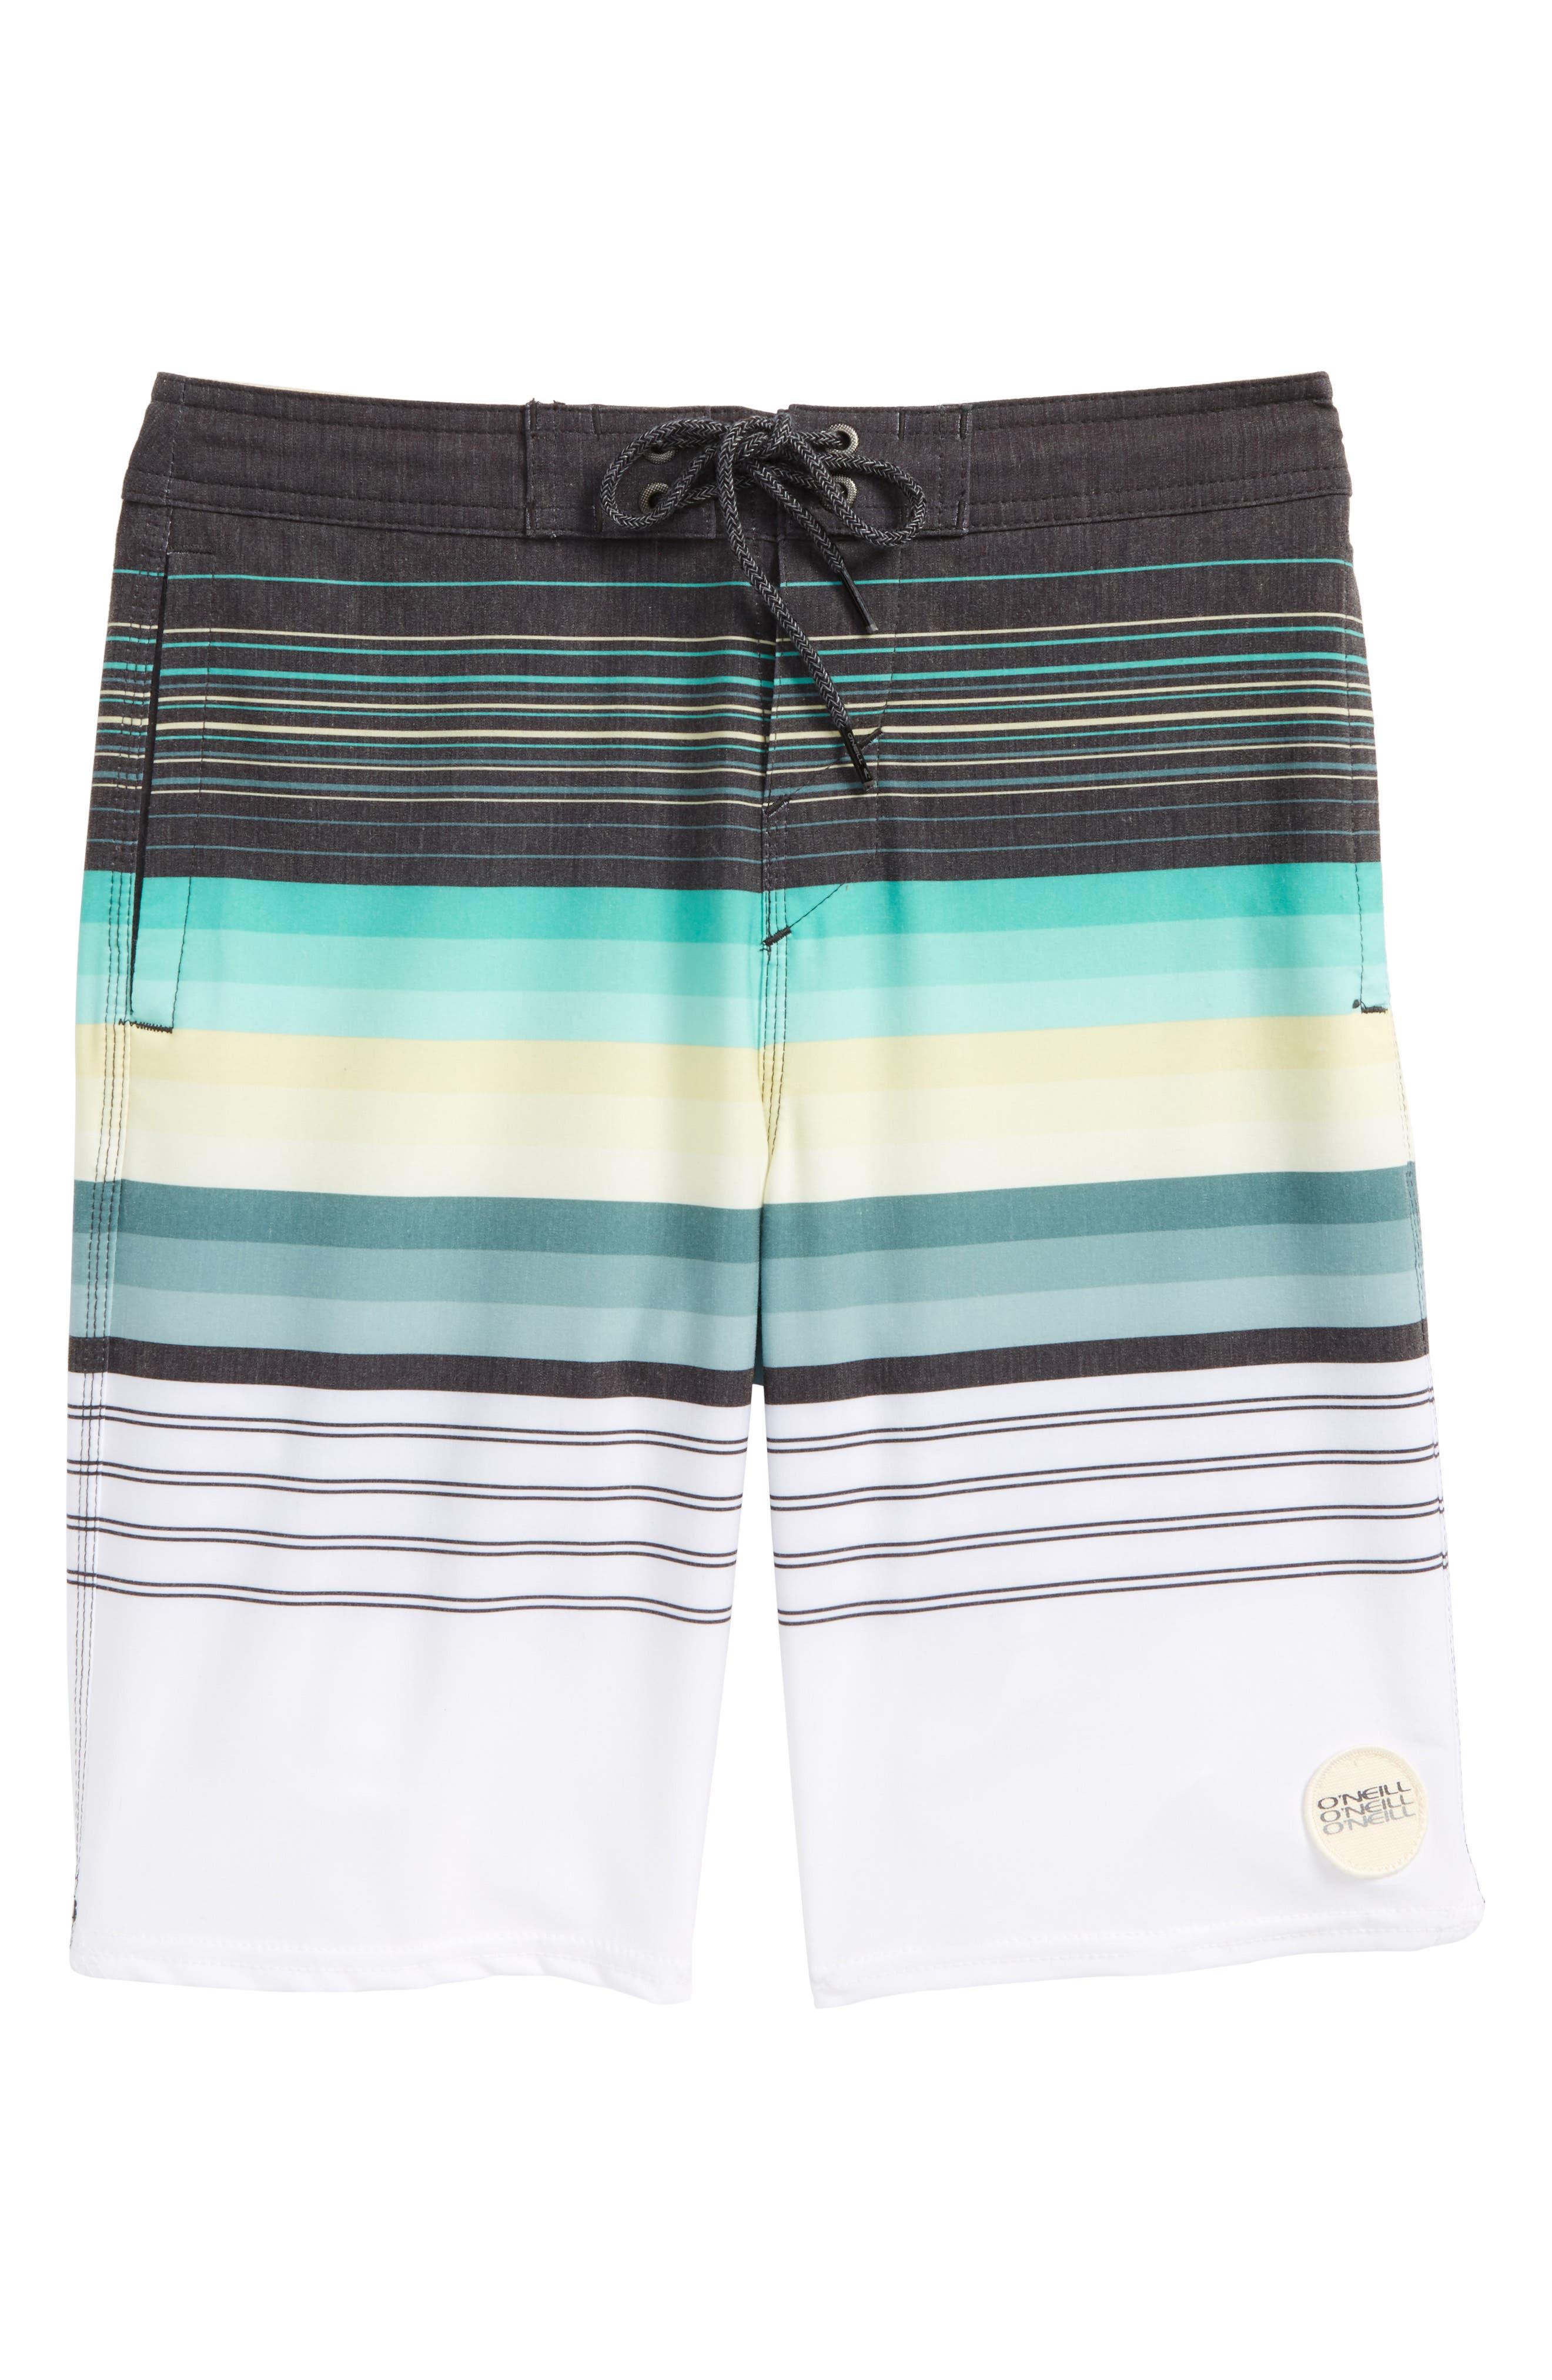 Sandbar Cruzer Board Shorts,                             Main thumbnail 1, color,                             001